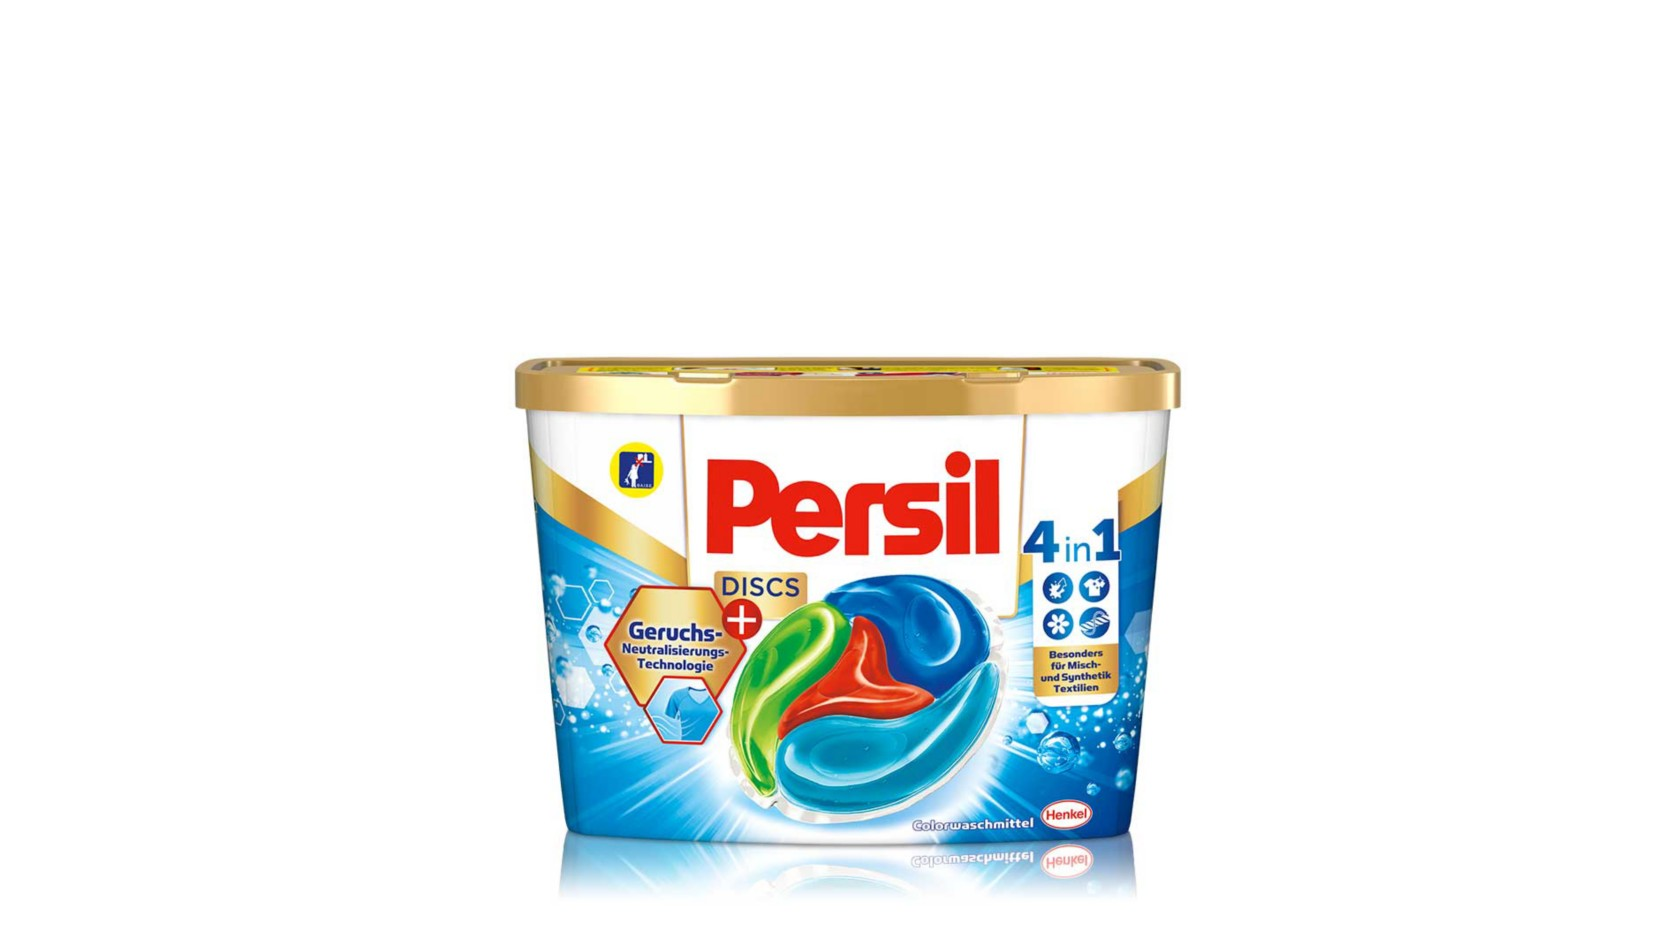 new-persil-de_discs-malodor_manual-teaser_16-9-ratio